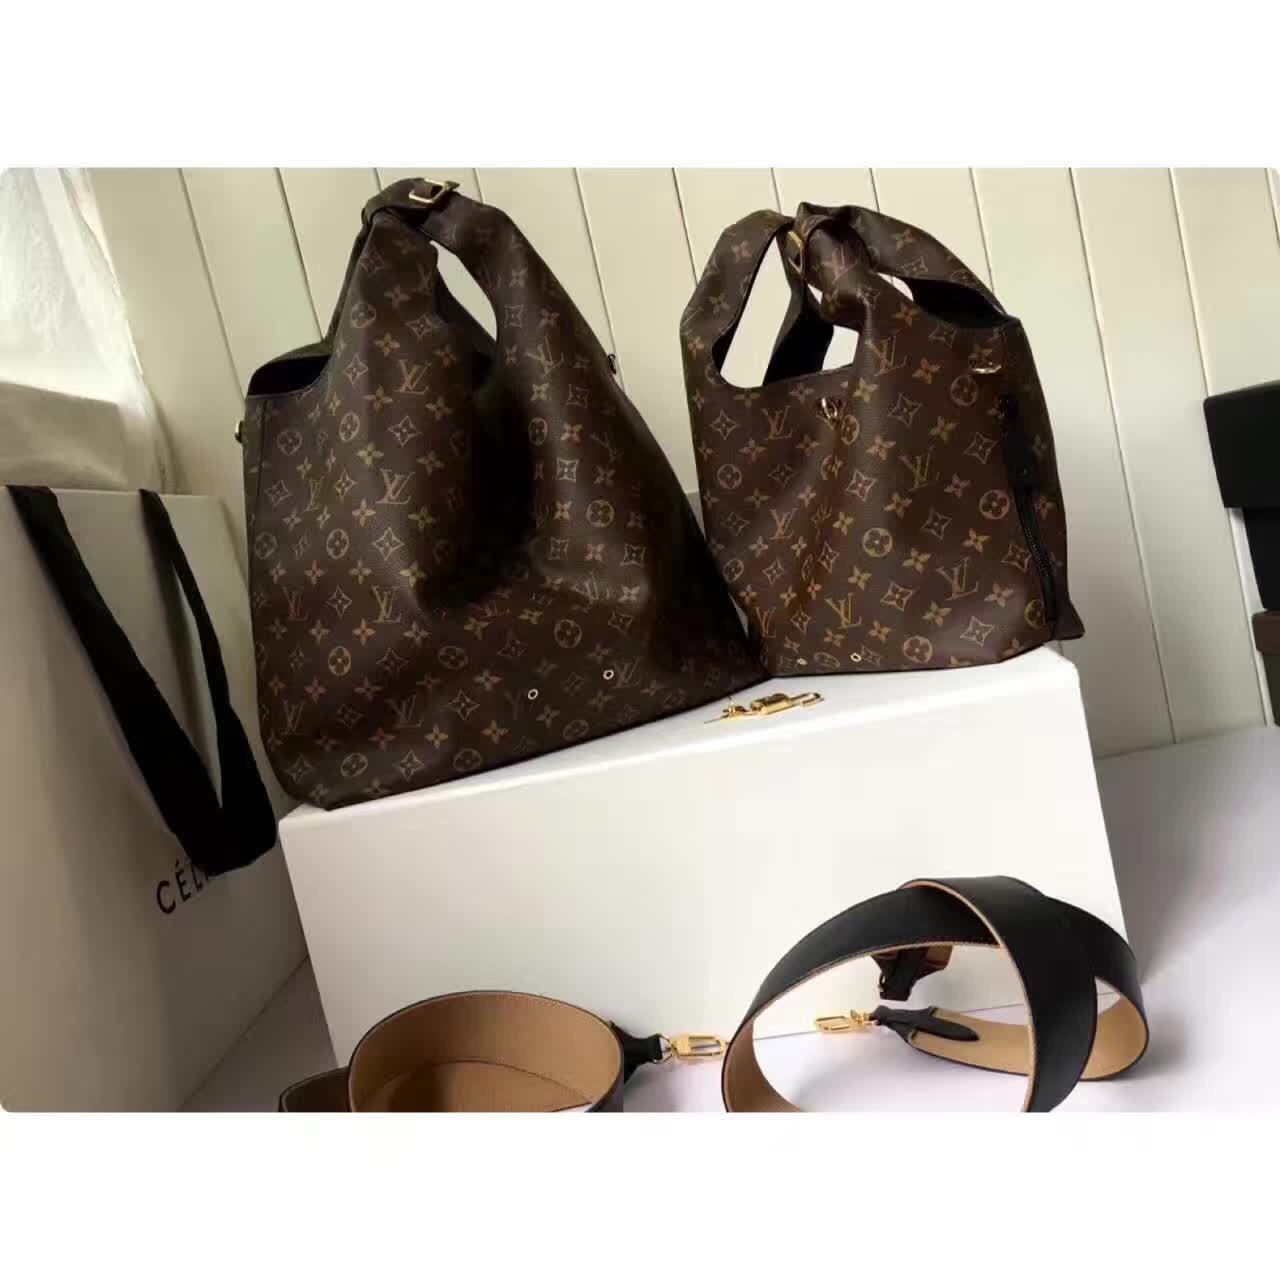 Сумка Louis Vuitton - копии брендовых сумок интернет   vkstore.com.ua c5416b95eed